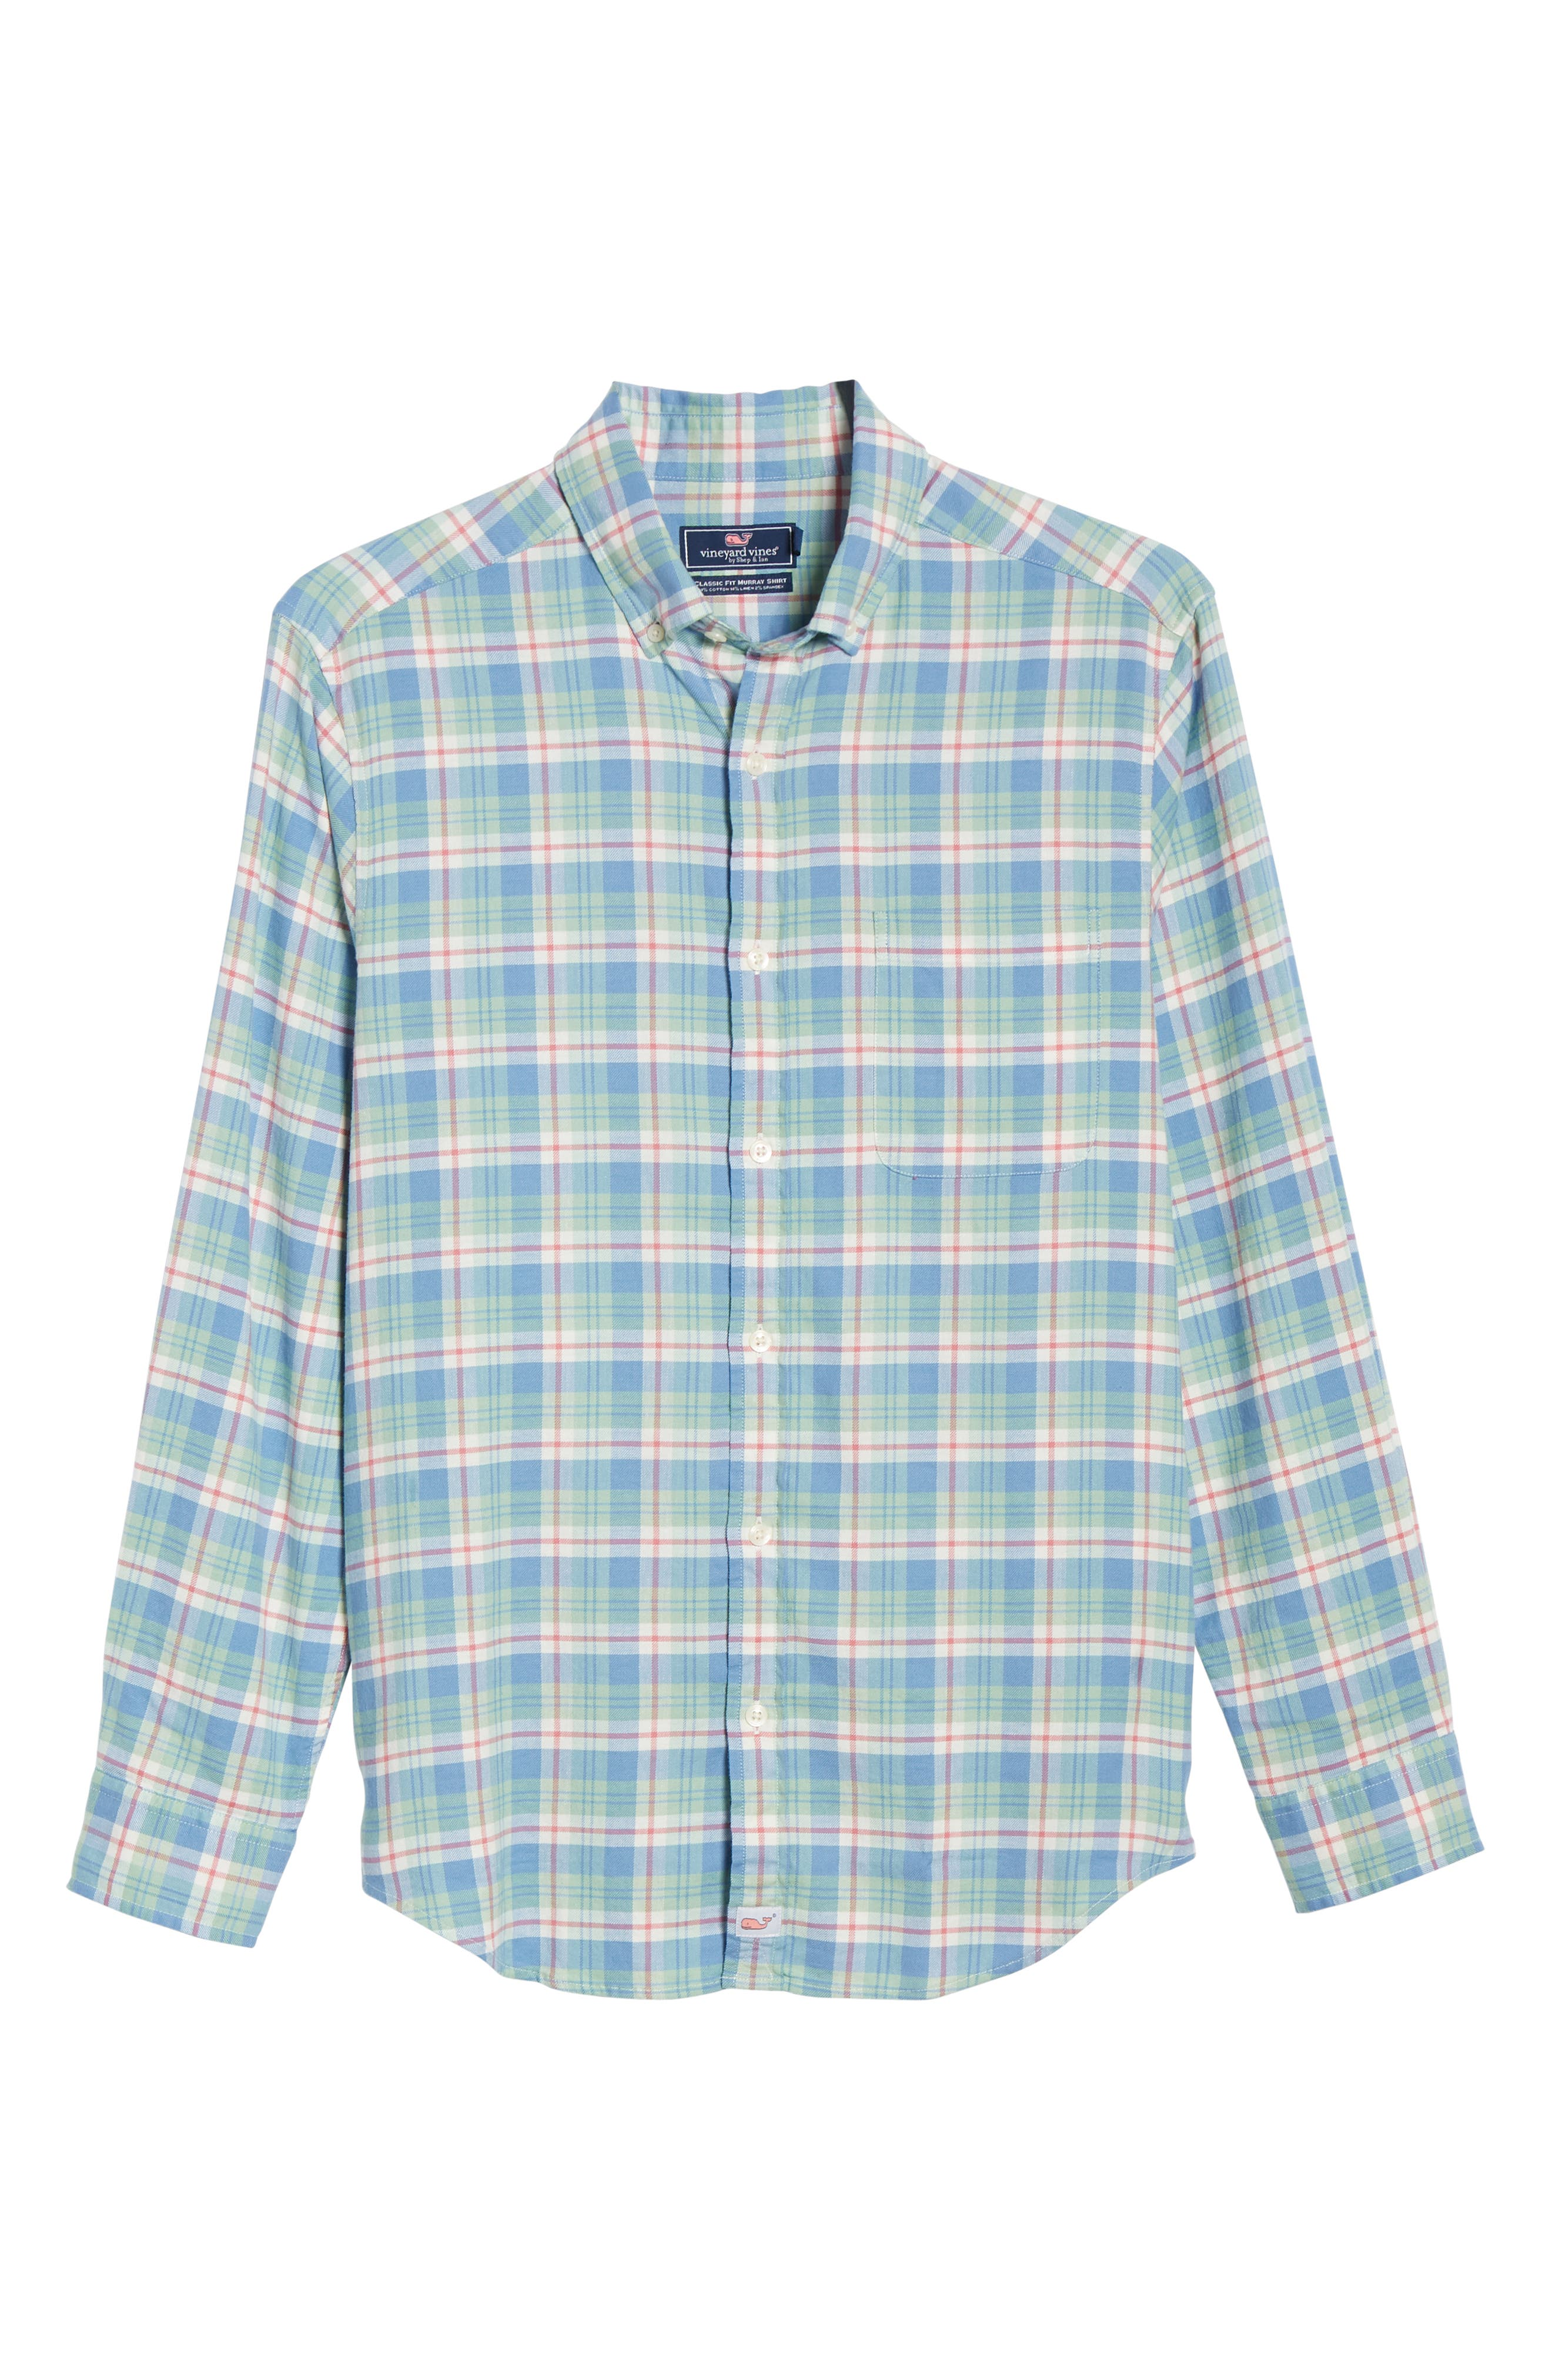 VINEYARD VINES,                             Murray Slim Fit Twill Sport Shirt,                             Alternate thumbnail 5, color,                             SEA KELP